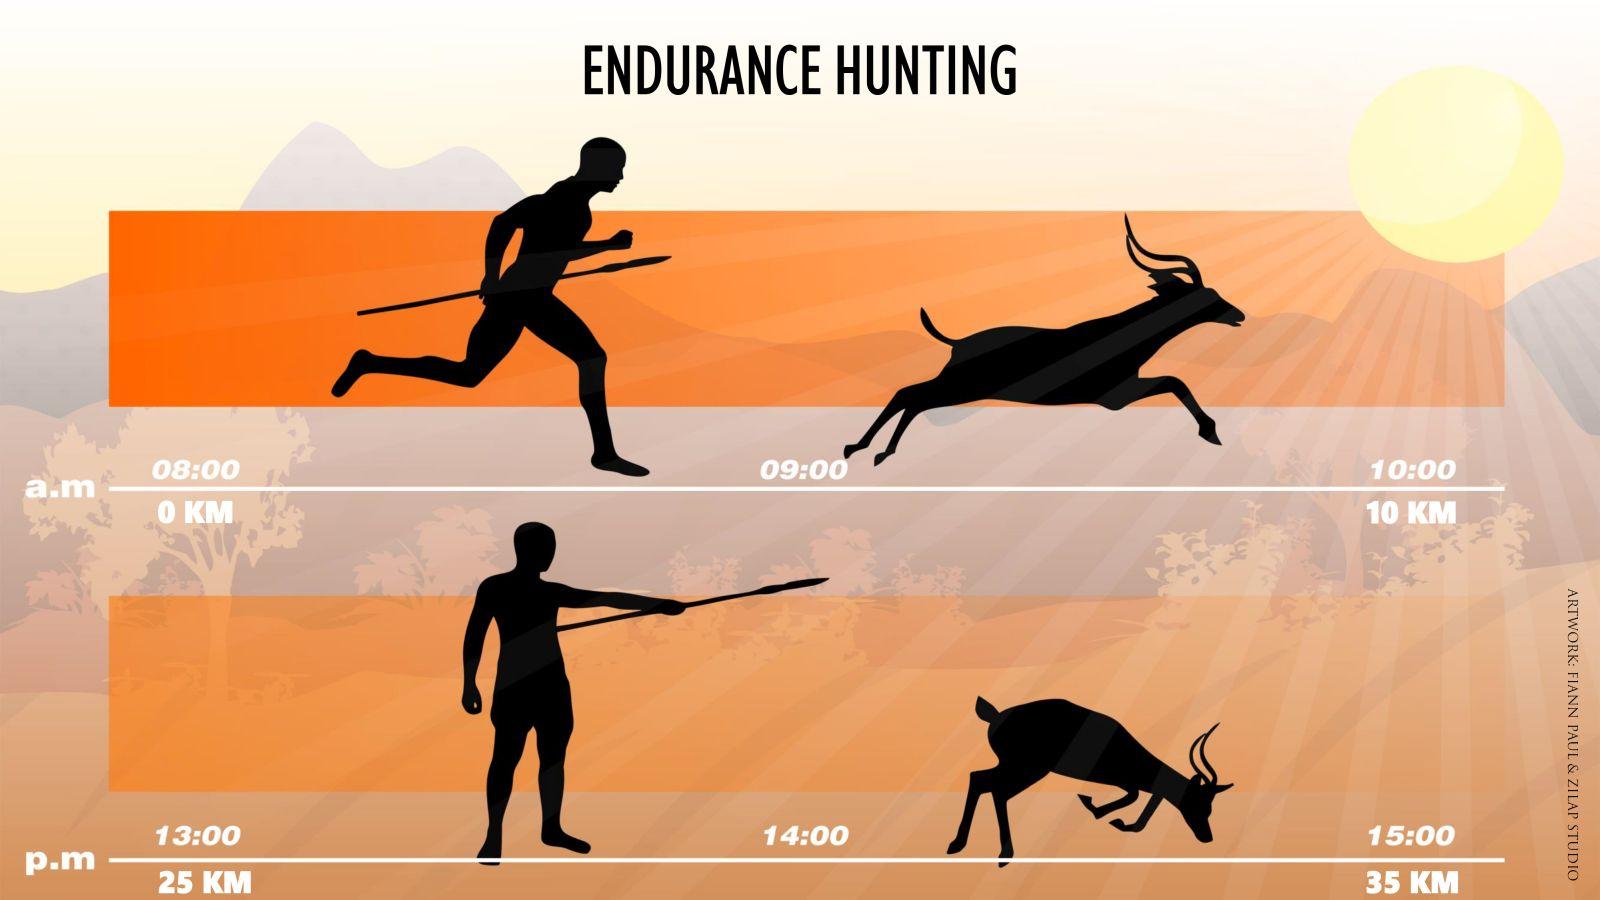 Fiann Paul endurance hunting lecture.jpg